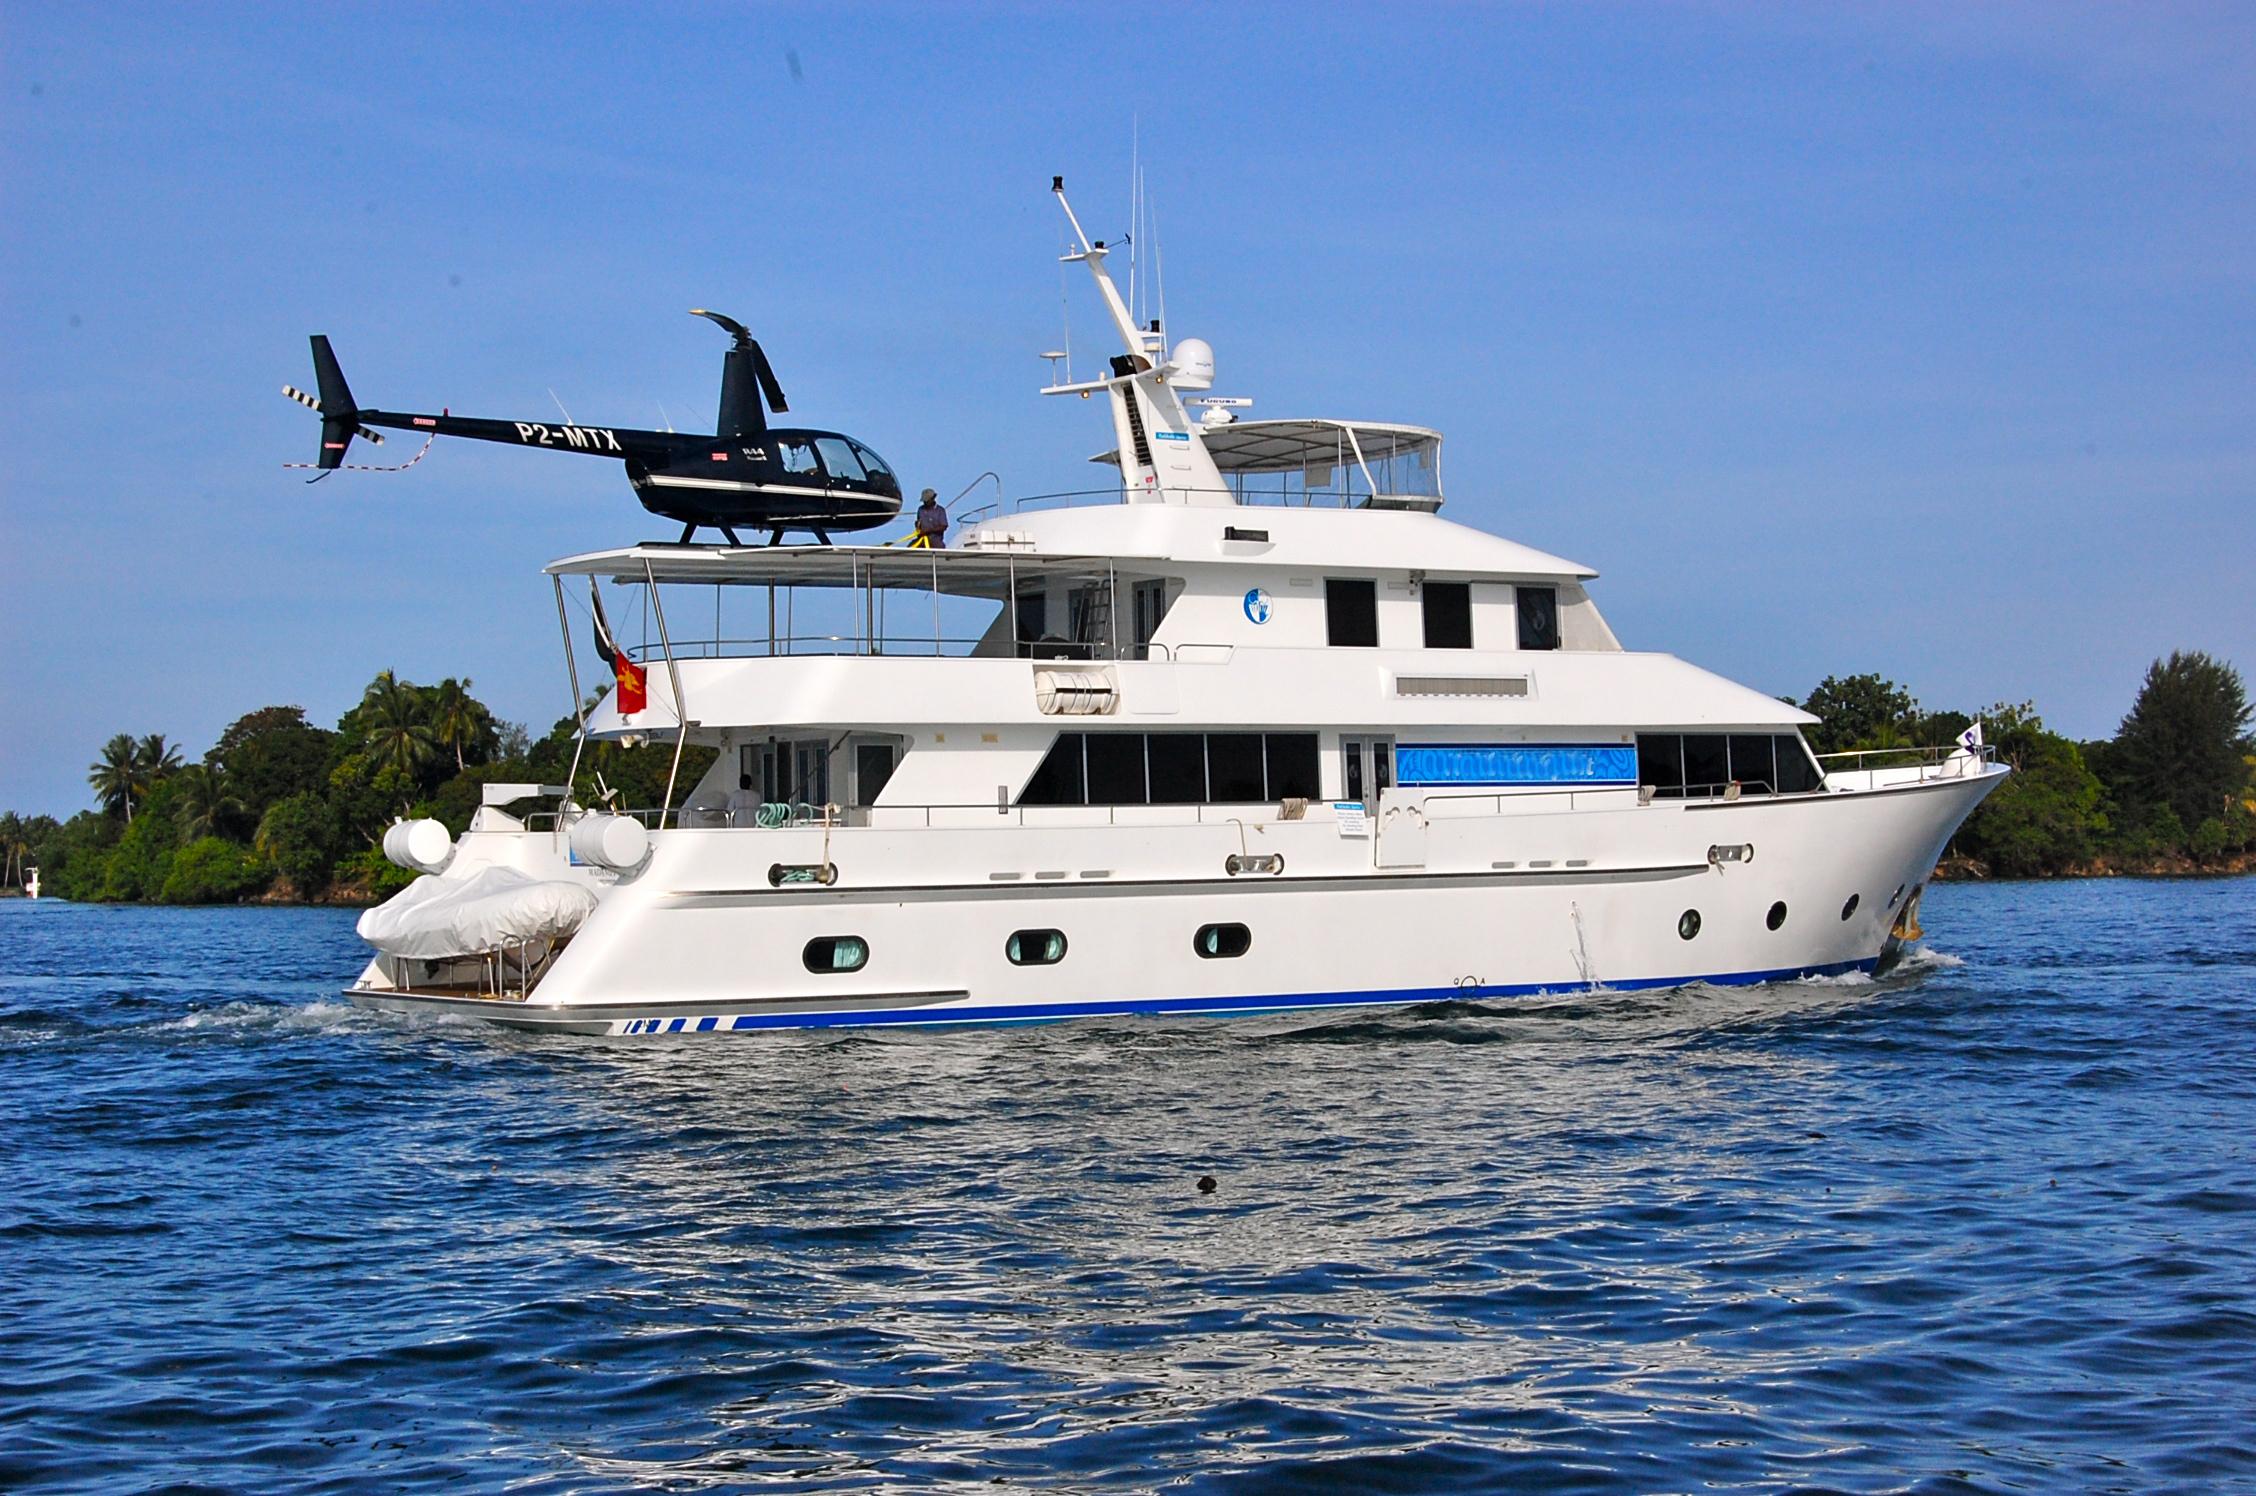 kalibobo spirit yacht charter details papua new guinea. Black Bedroom Furniture Sets. Home Design Ideas